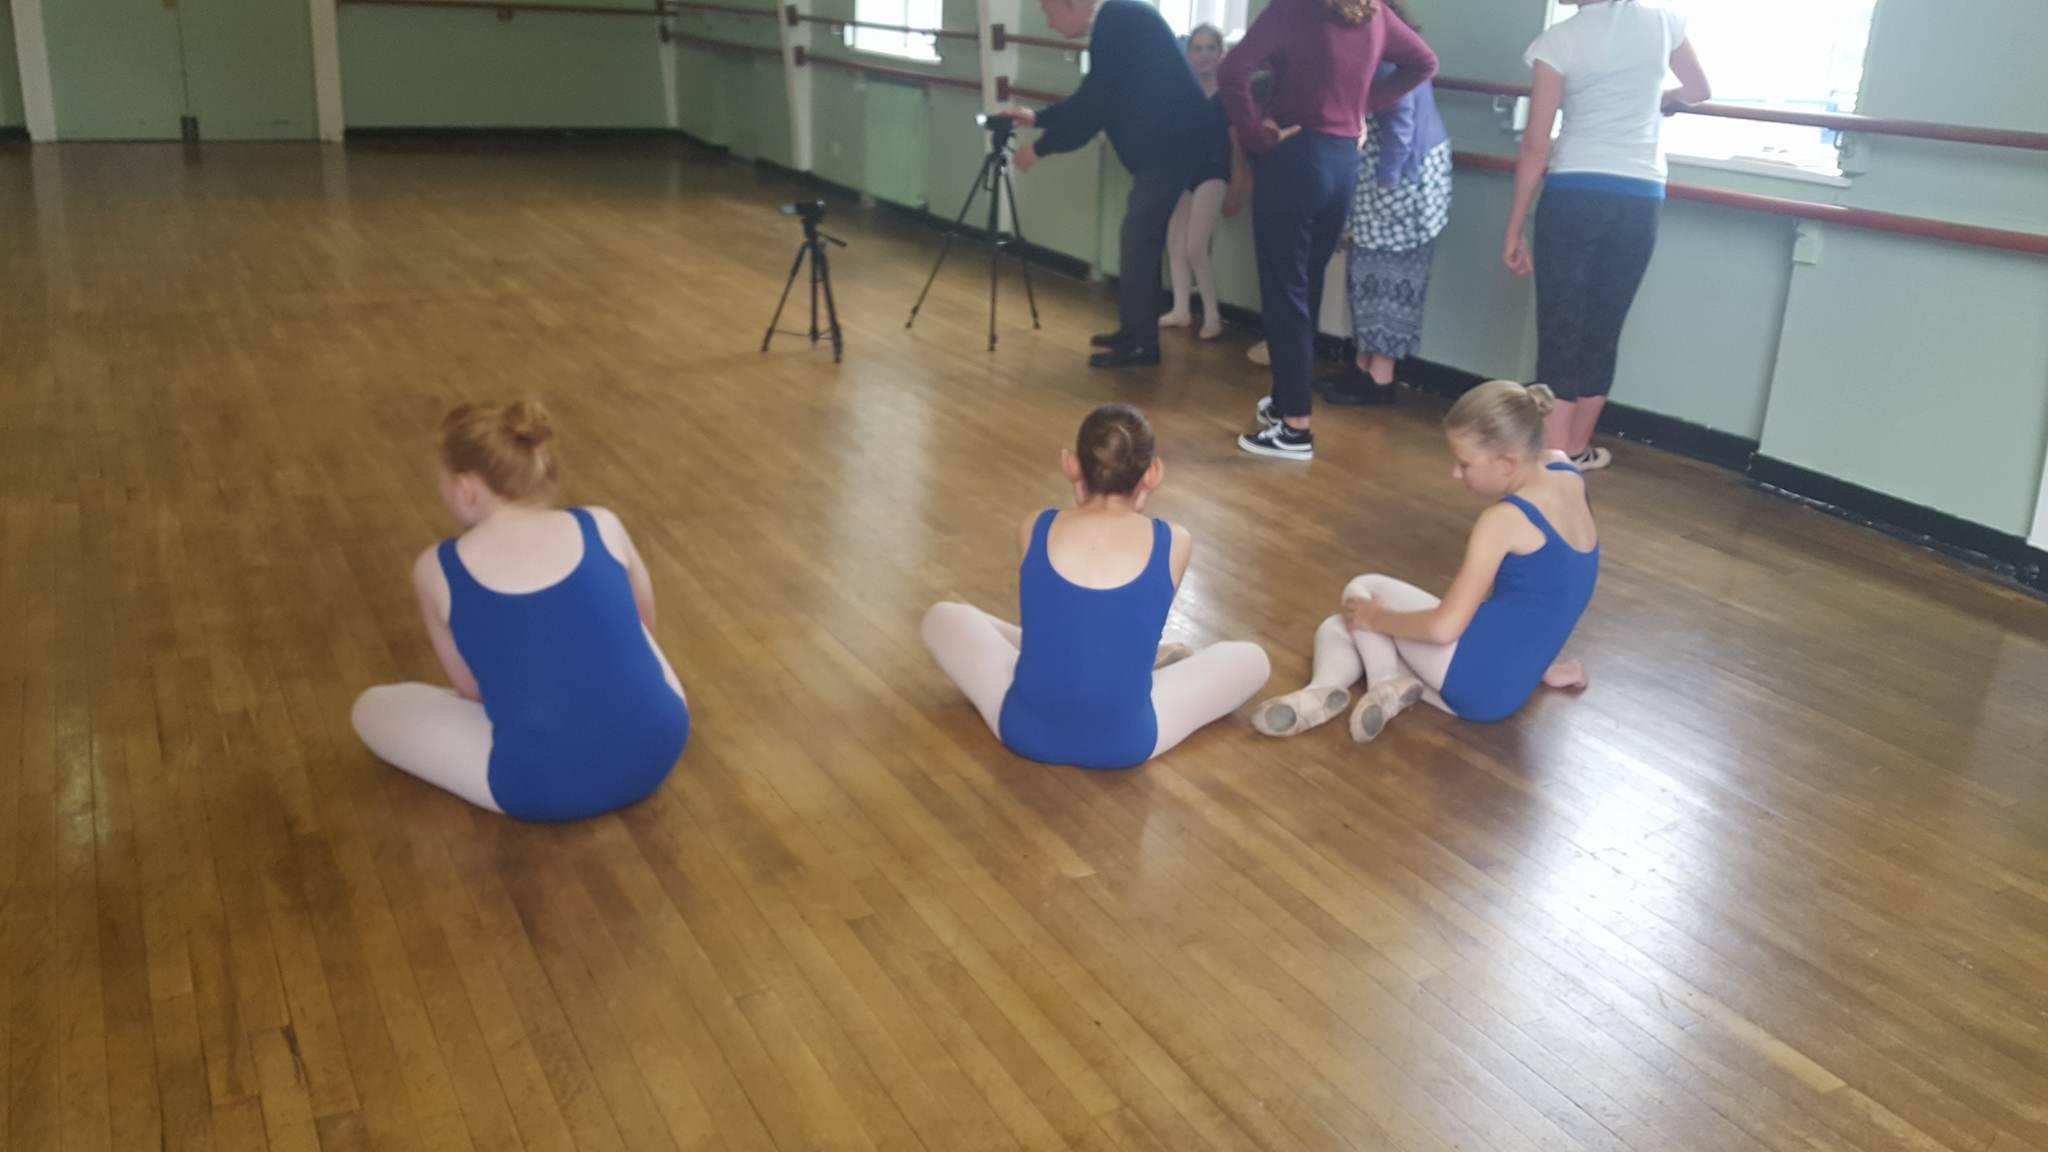 Lymington Centre filming project